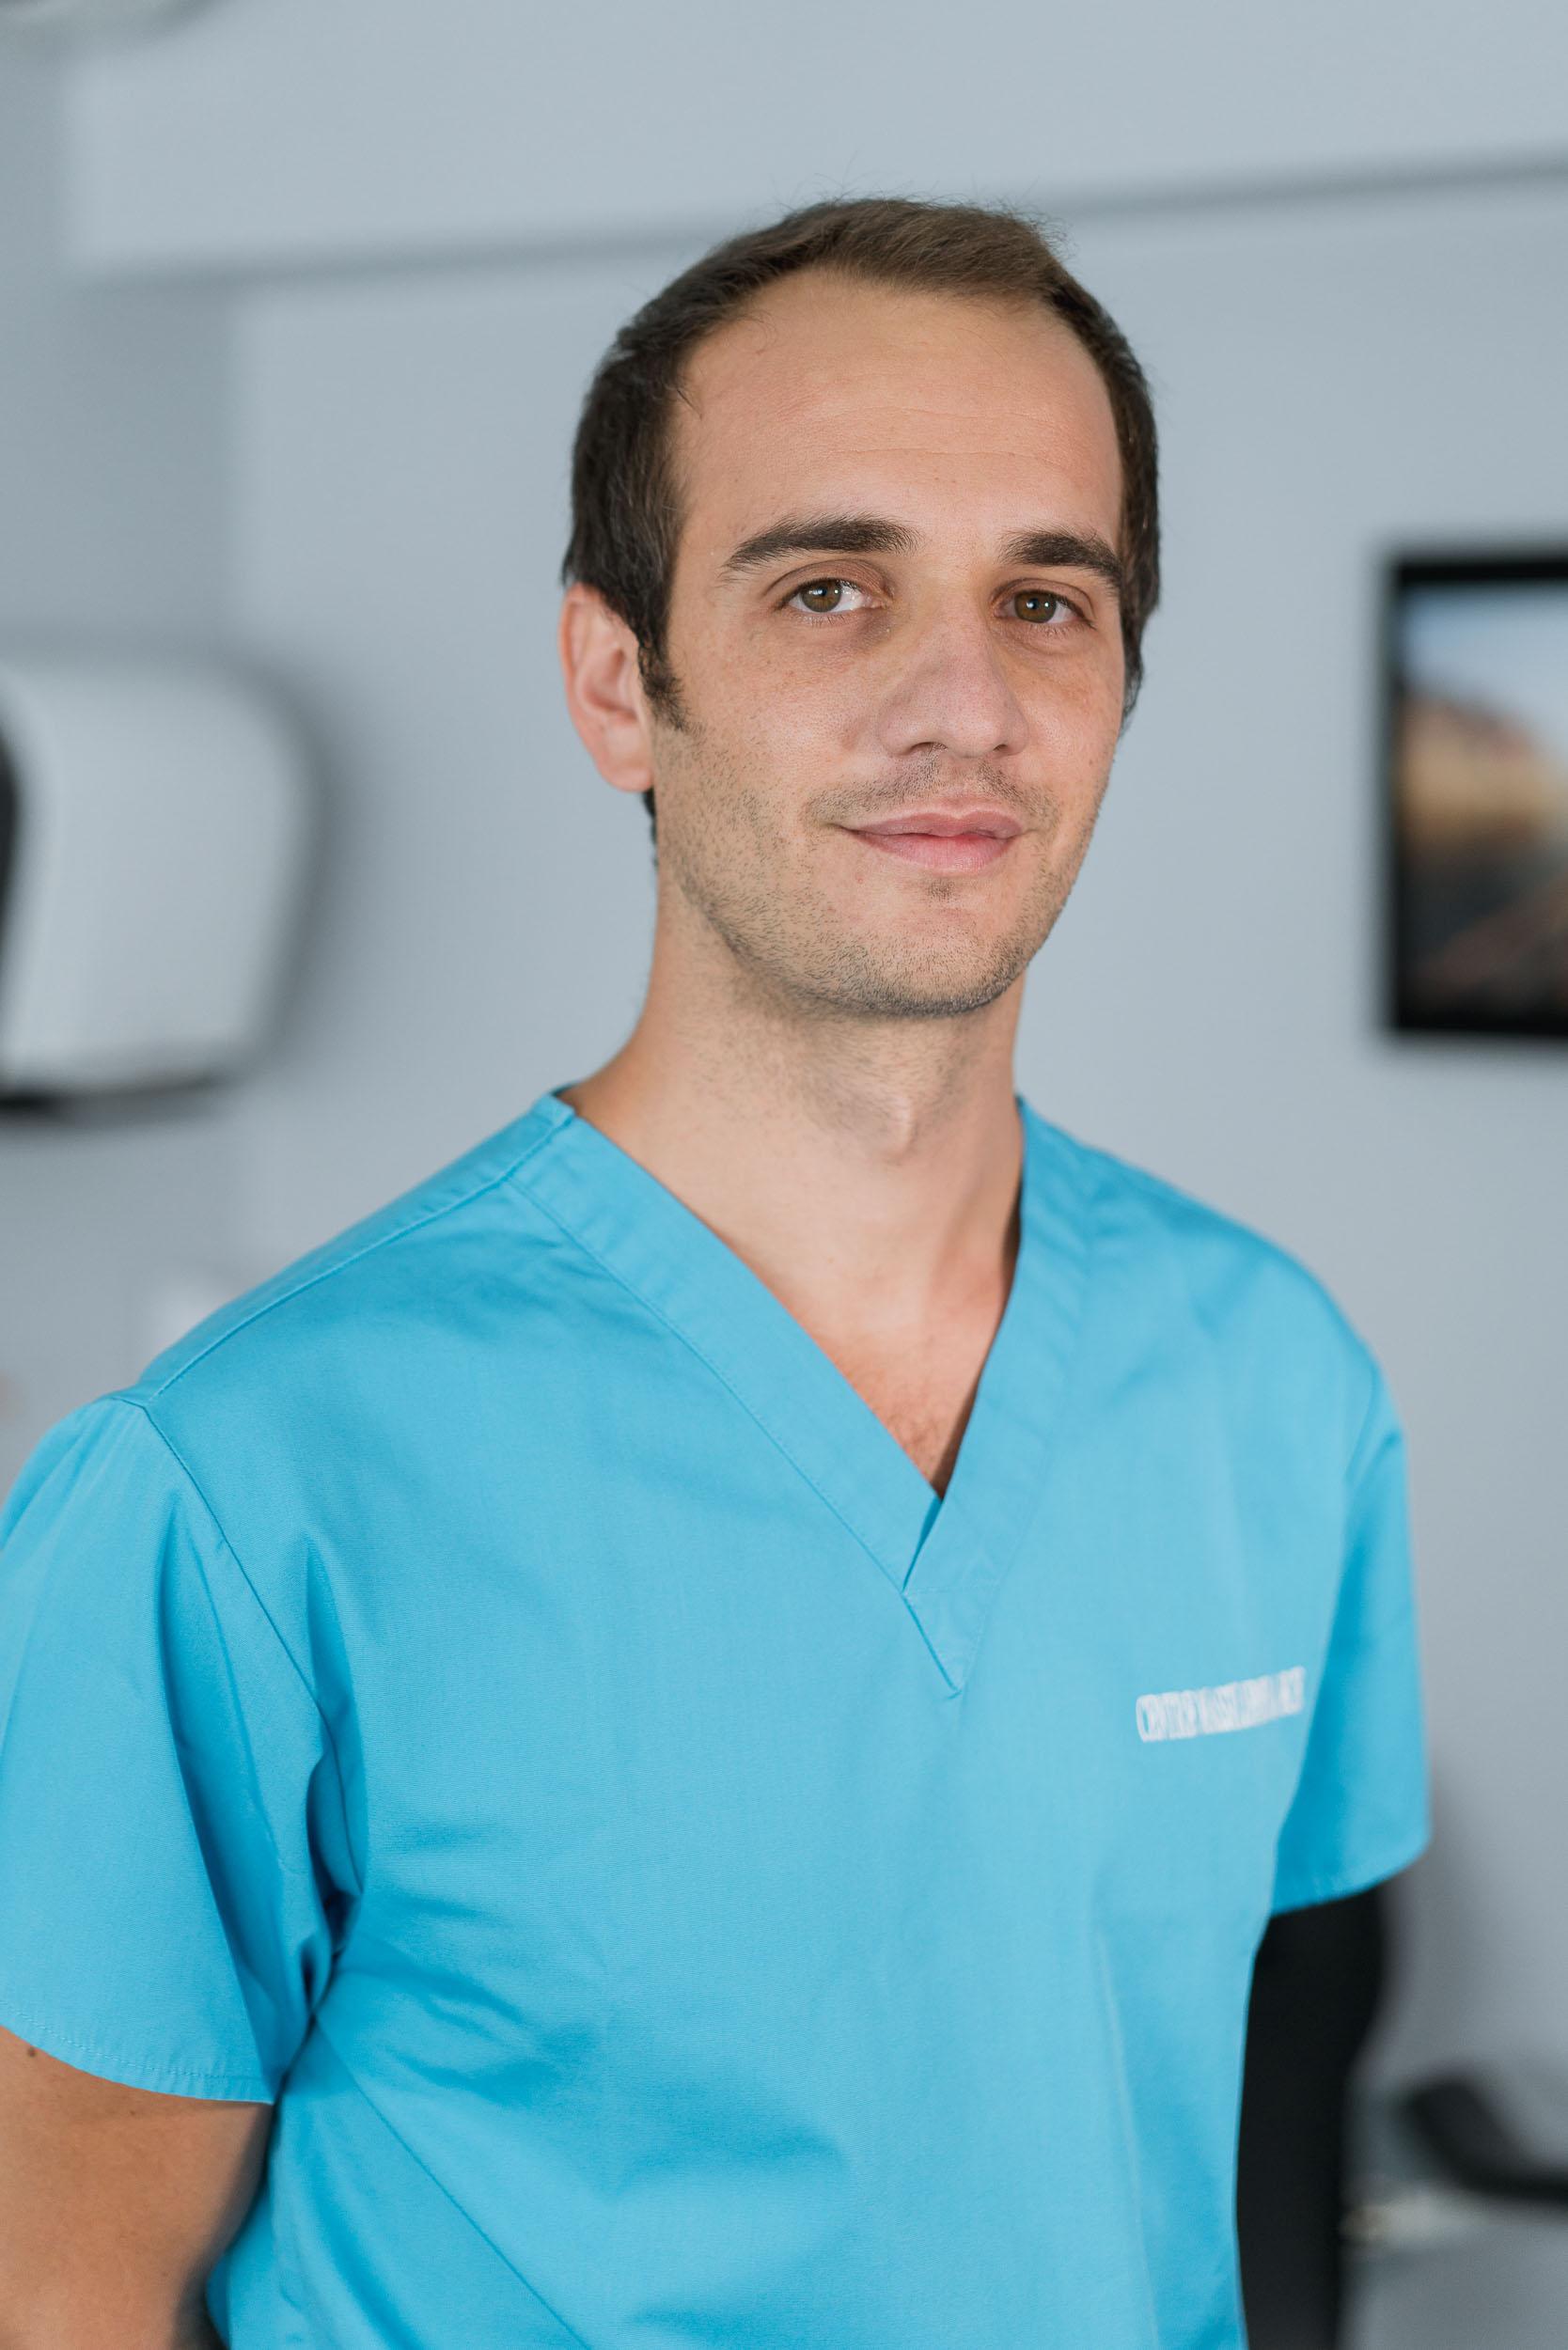 Docteur Ugo Ordioni